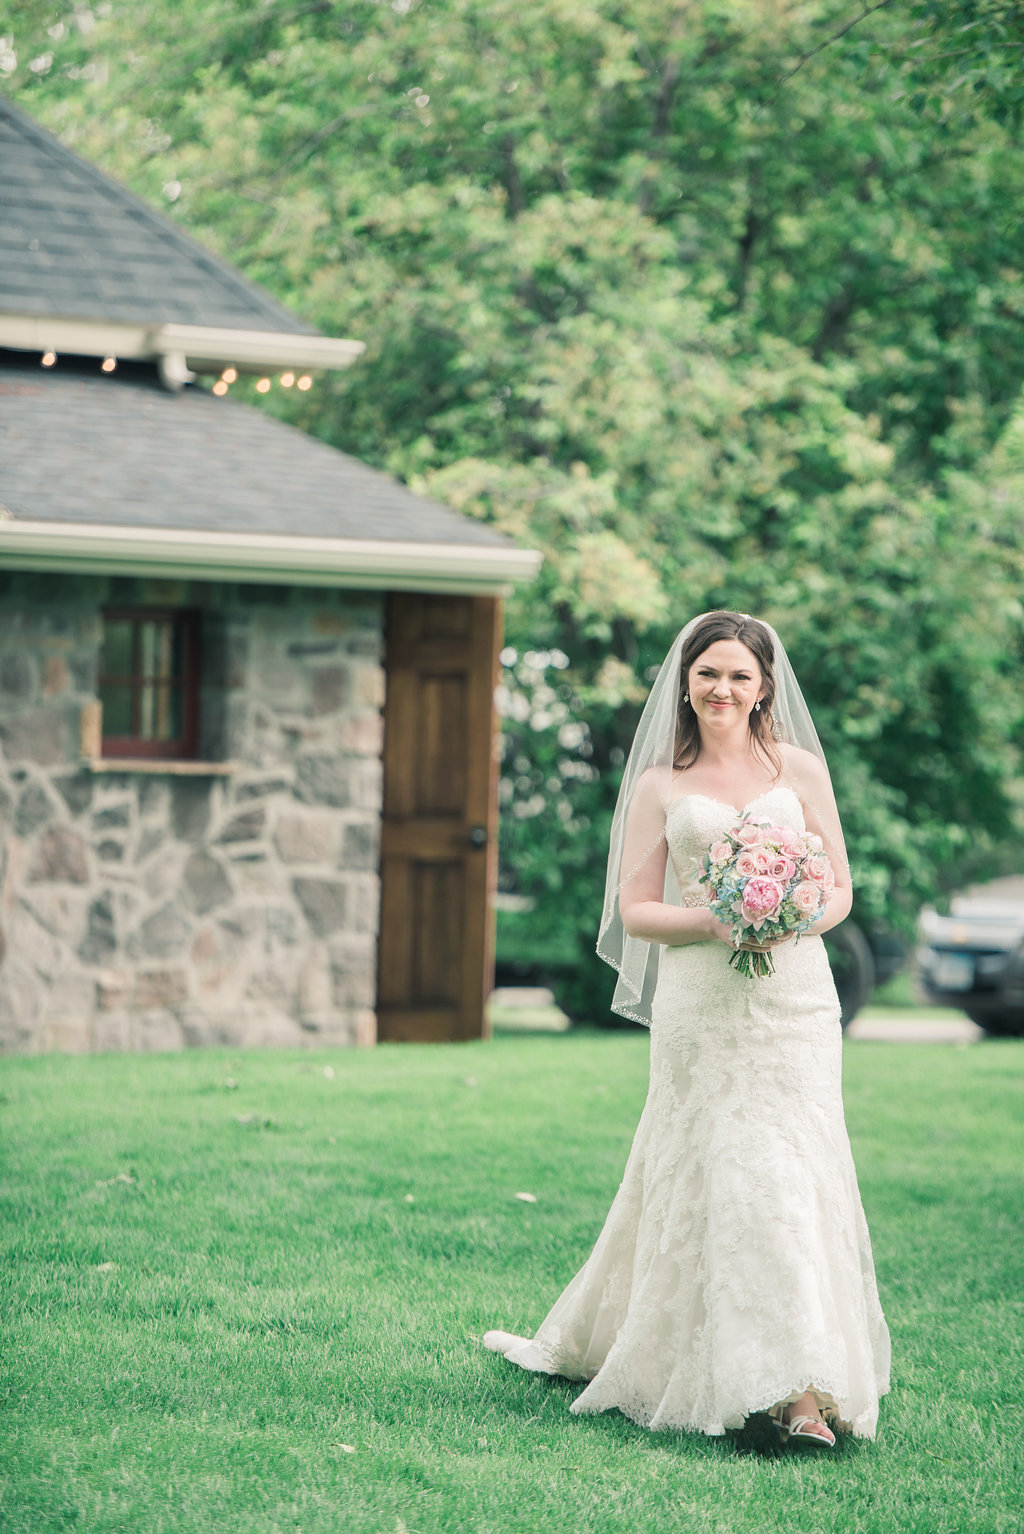 20170527_Roberts_Wedding_0017.jpg